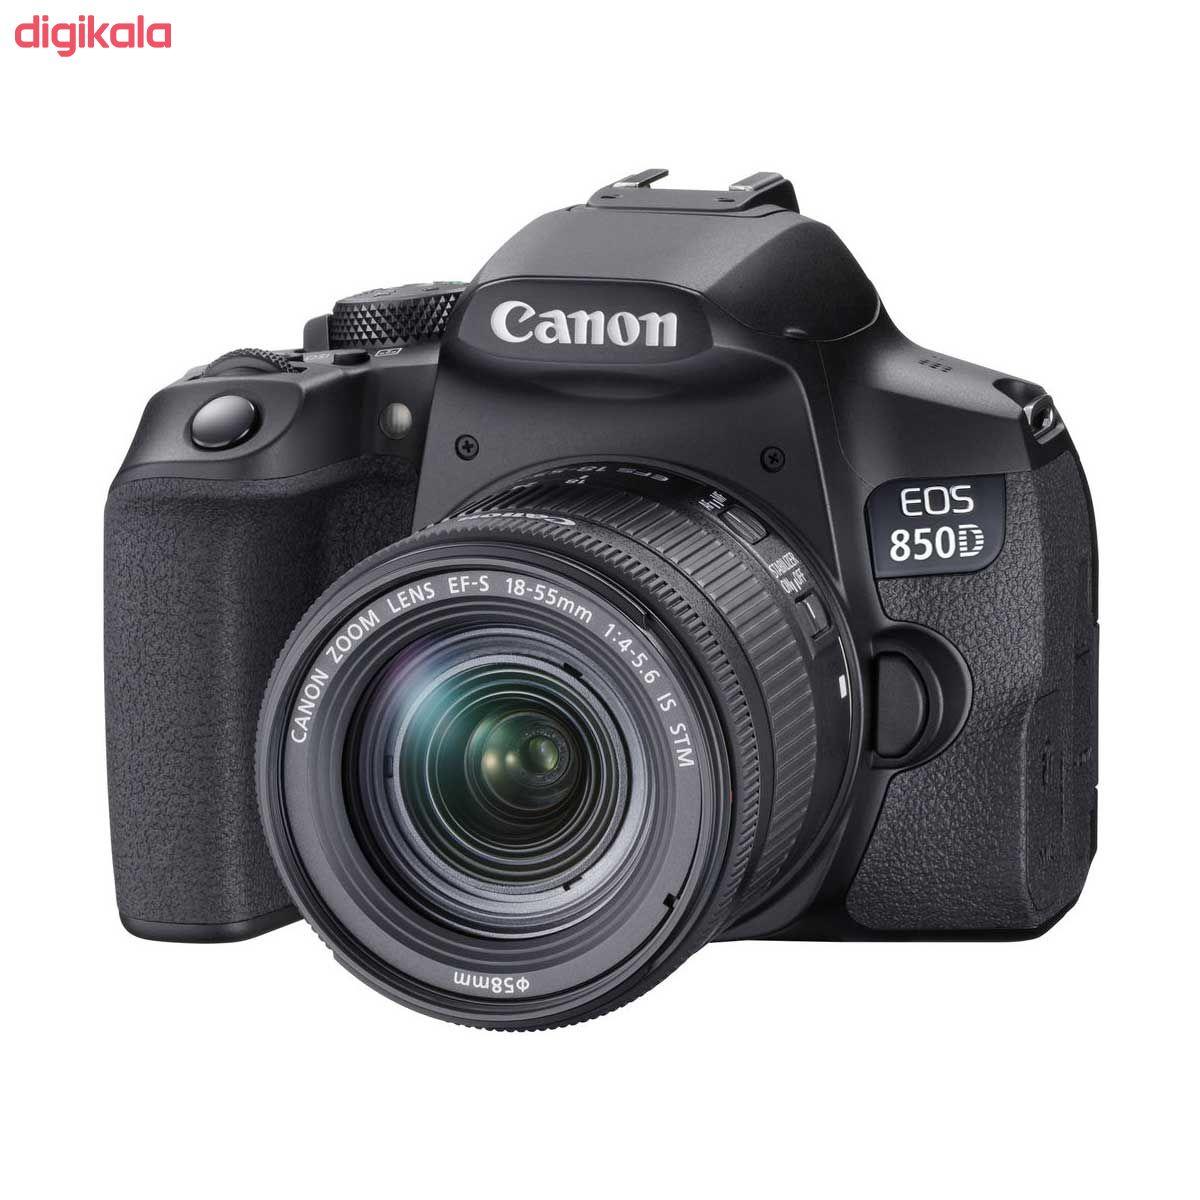 دوربین دیجیتال کانن مدل EOS 850D به همراه لنز 55-18 میلی متر IS STM main 1 1